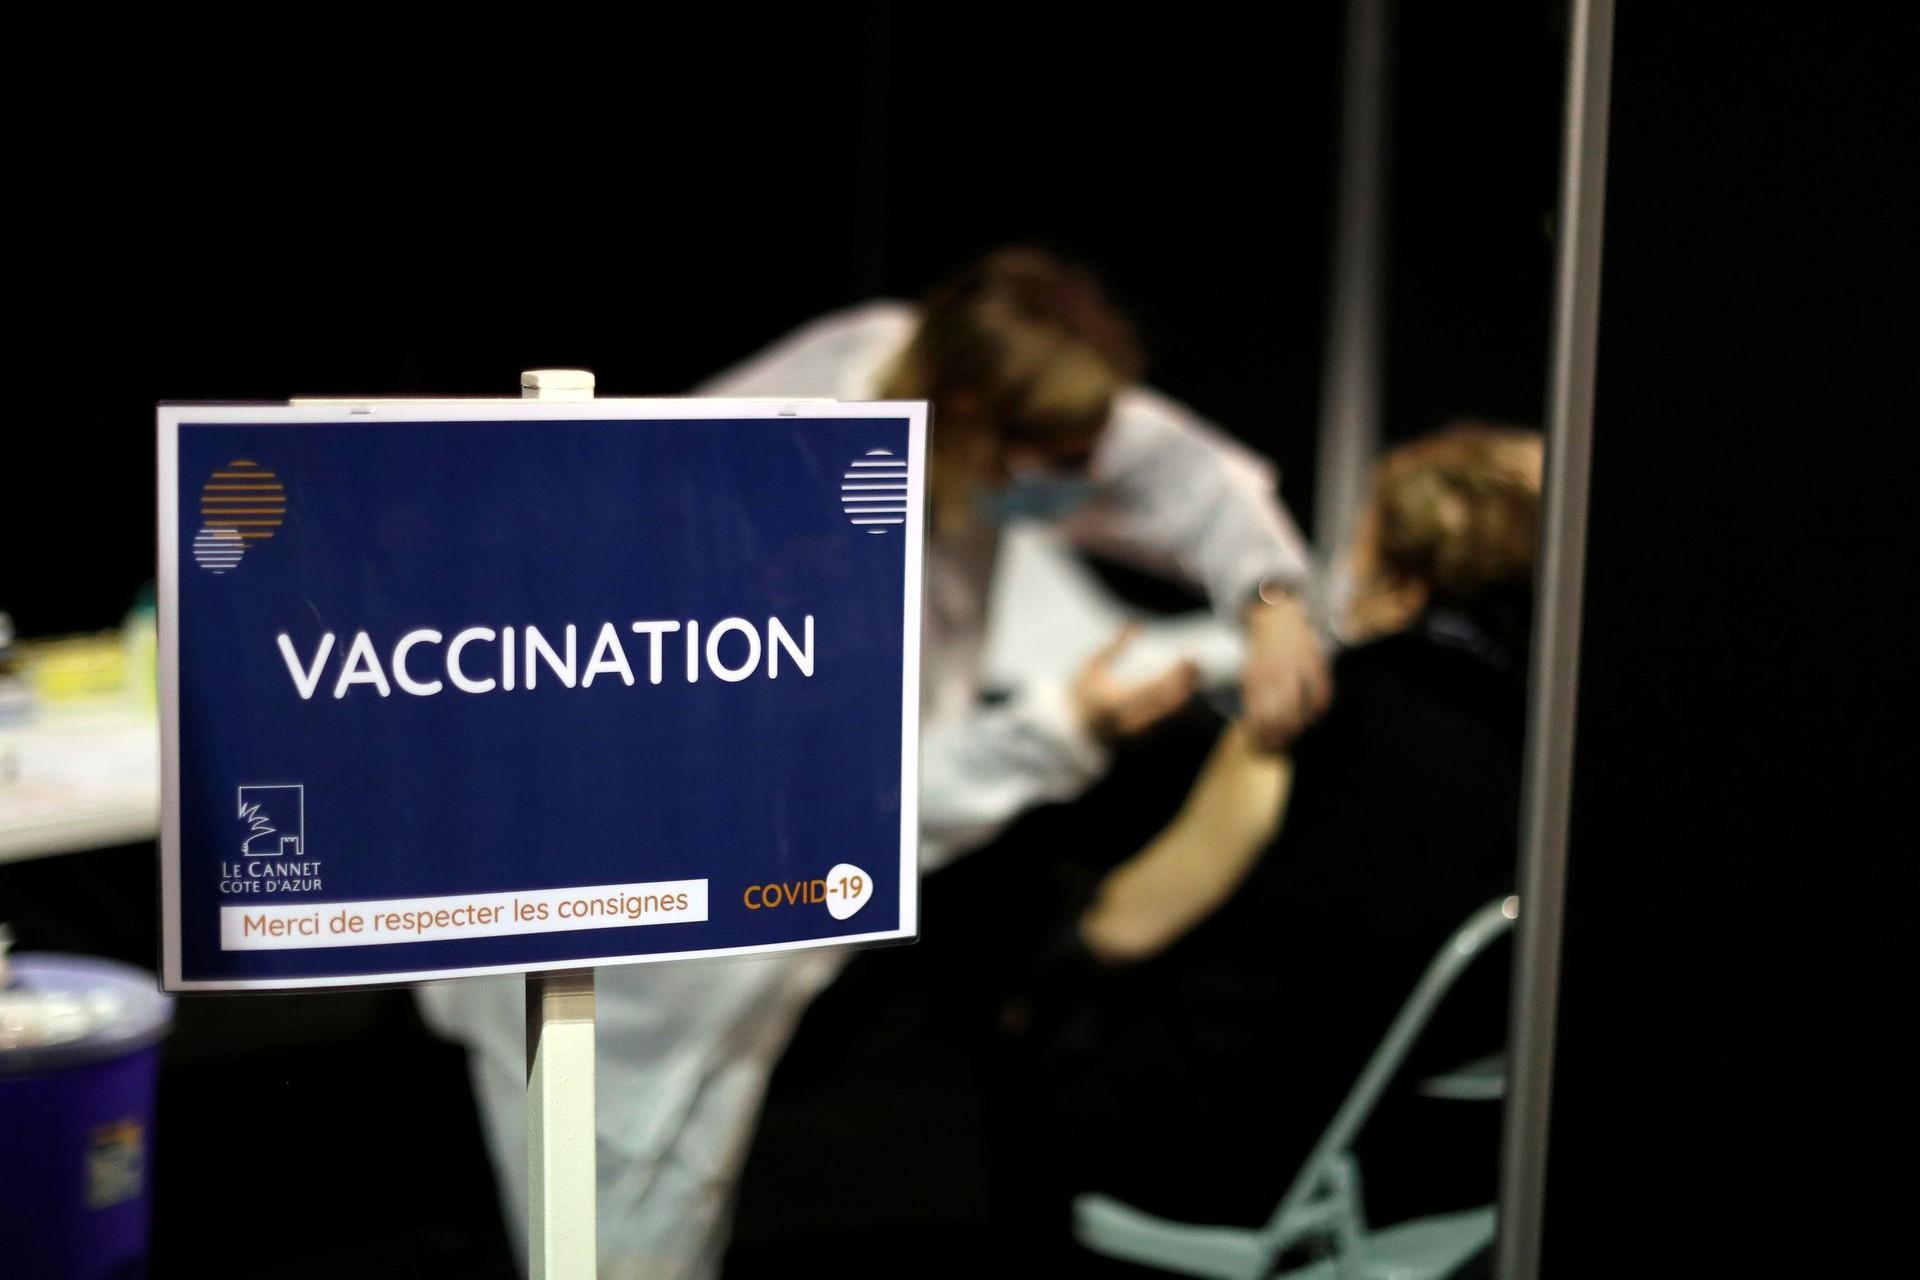 Punkt za vakcinaciju građana protiv virusa COVID-19 u Le Kaneu (Francuska), 19. januar 2021. (Foto: Reuters/Eric Gaillard)